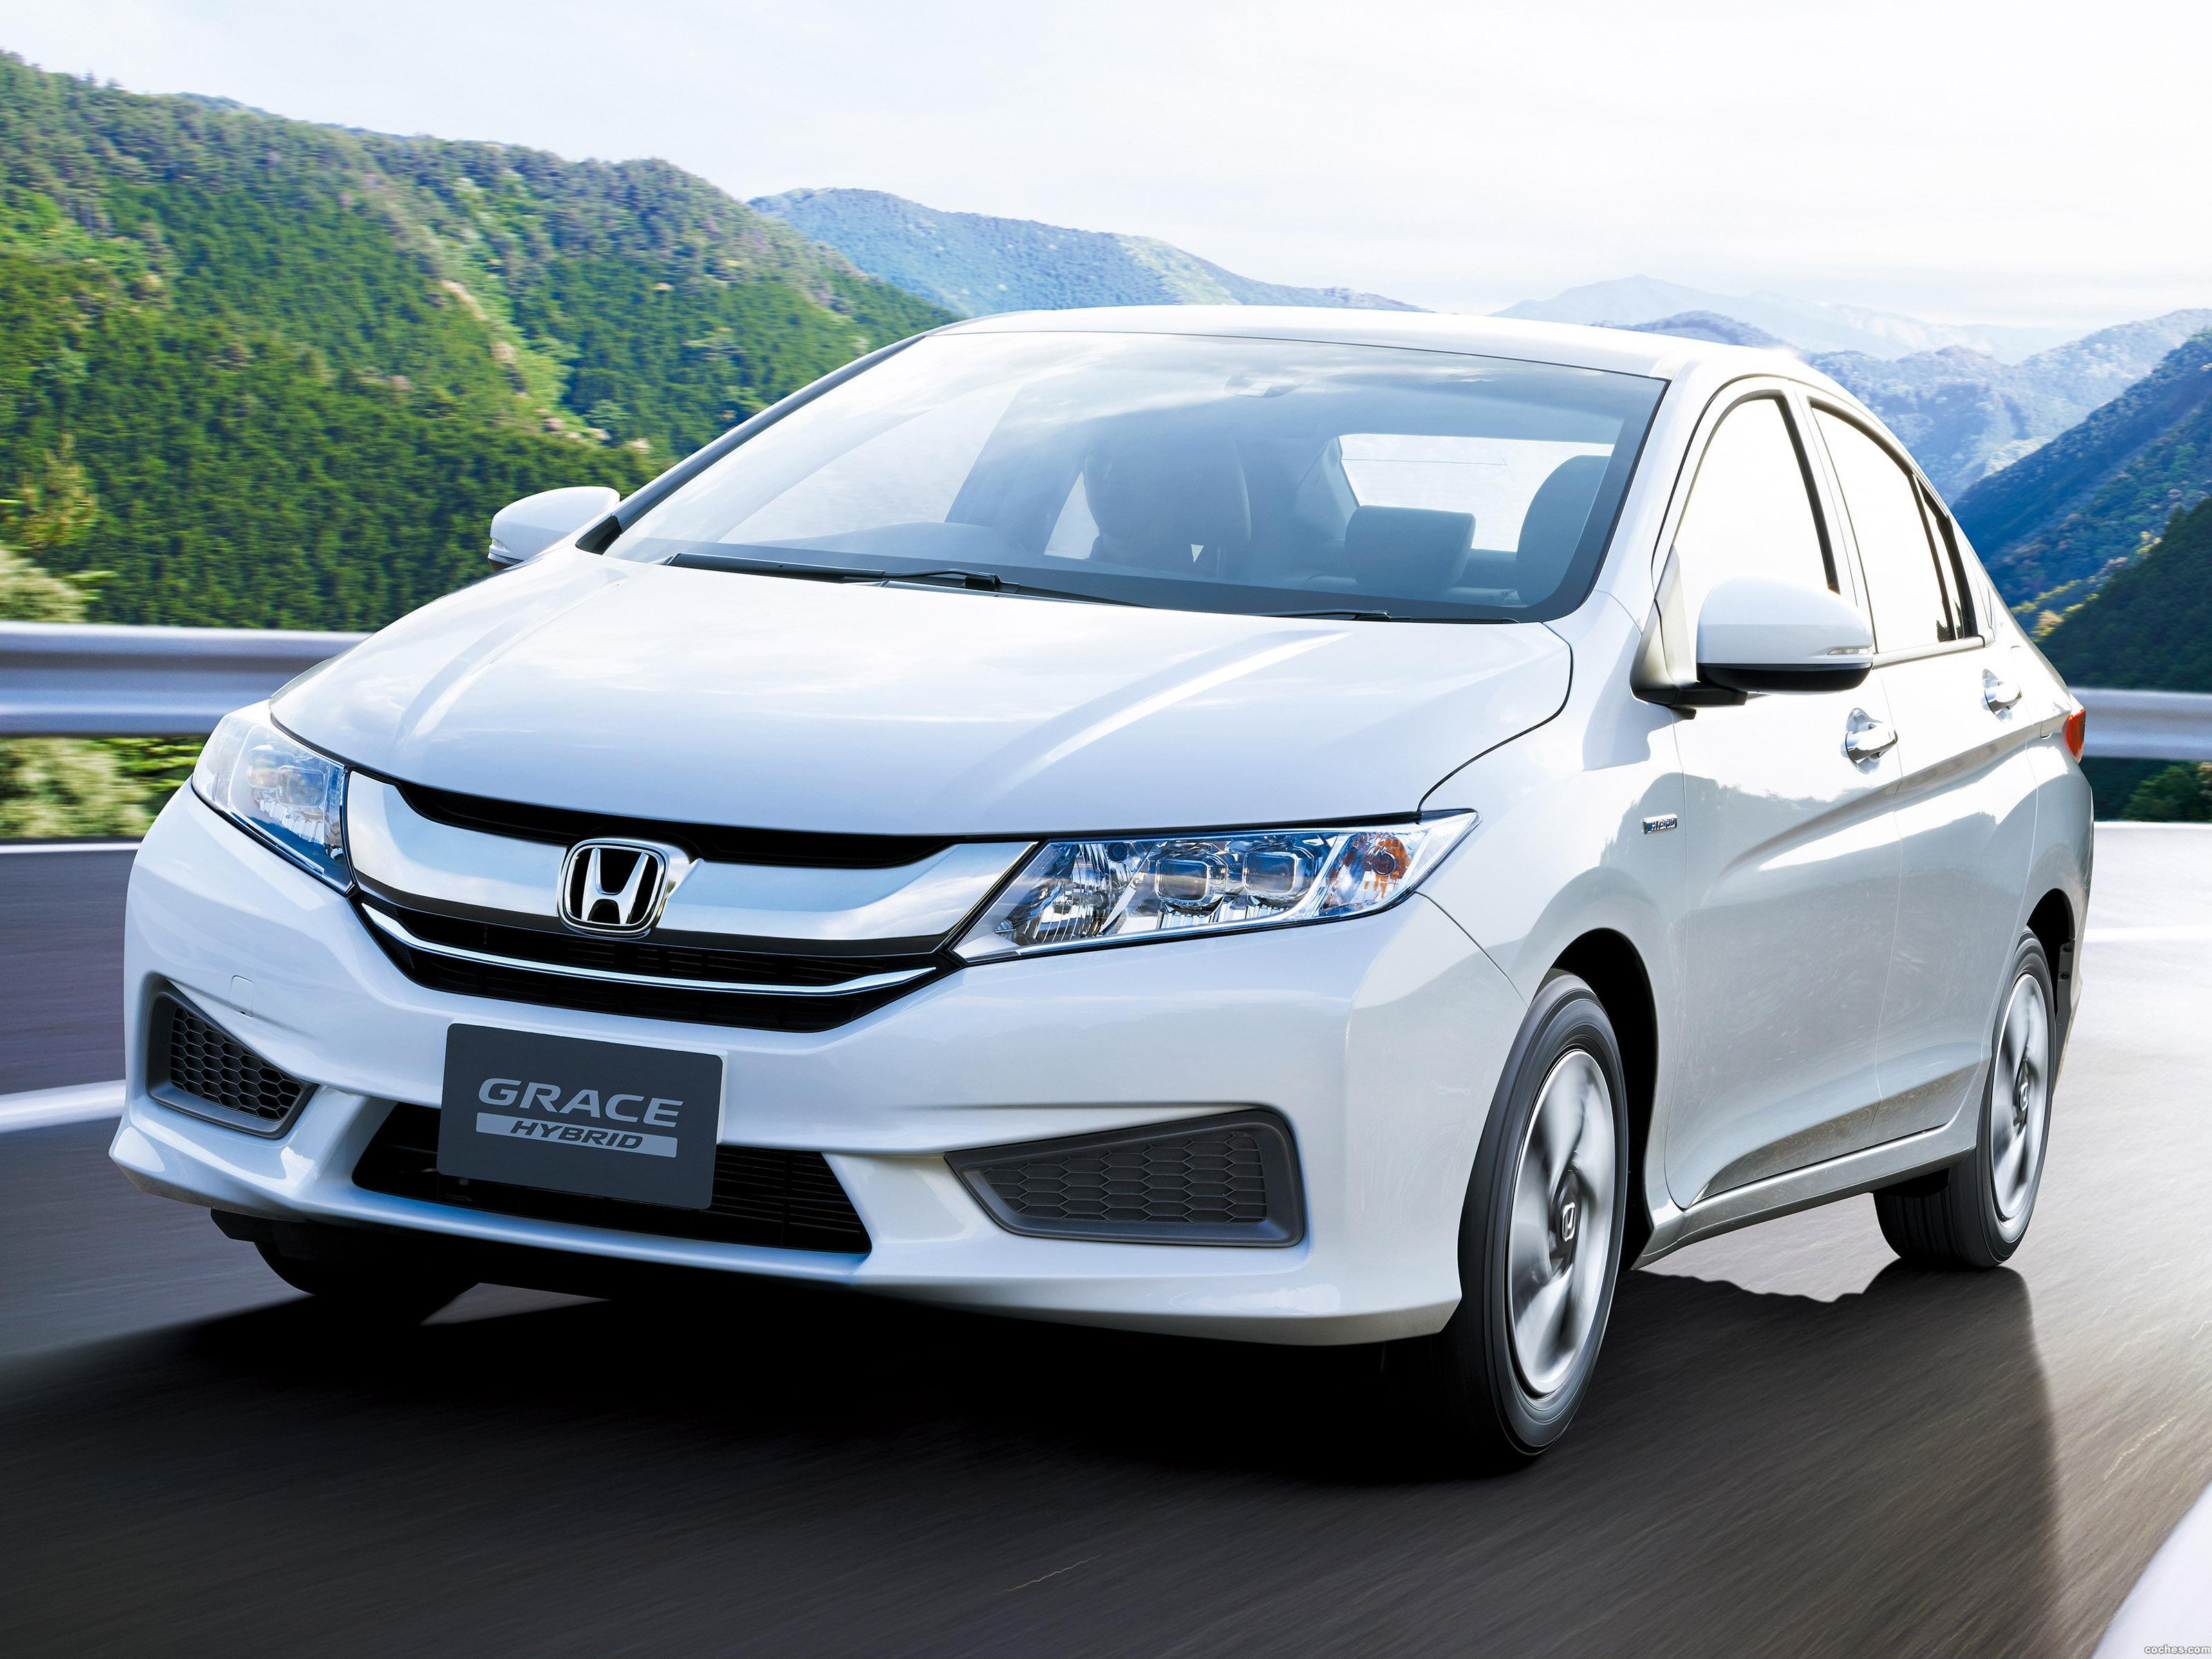 Foto 0 de Honda Grace Hybrid 2014